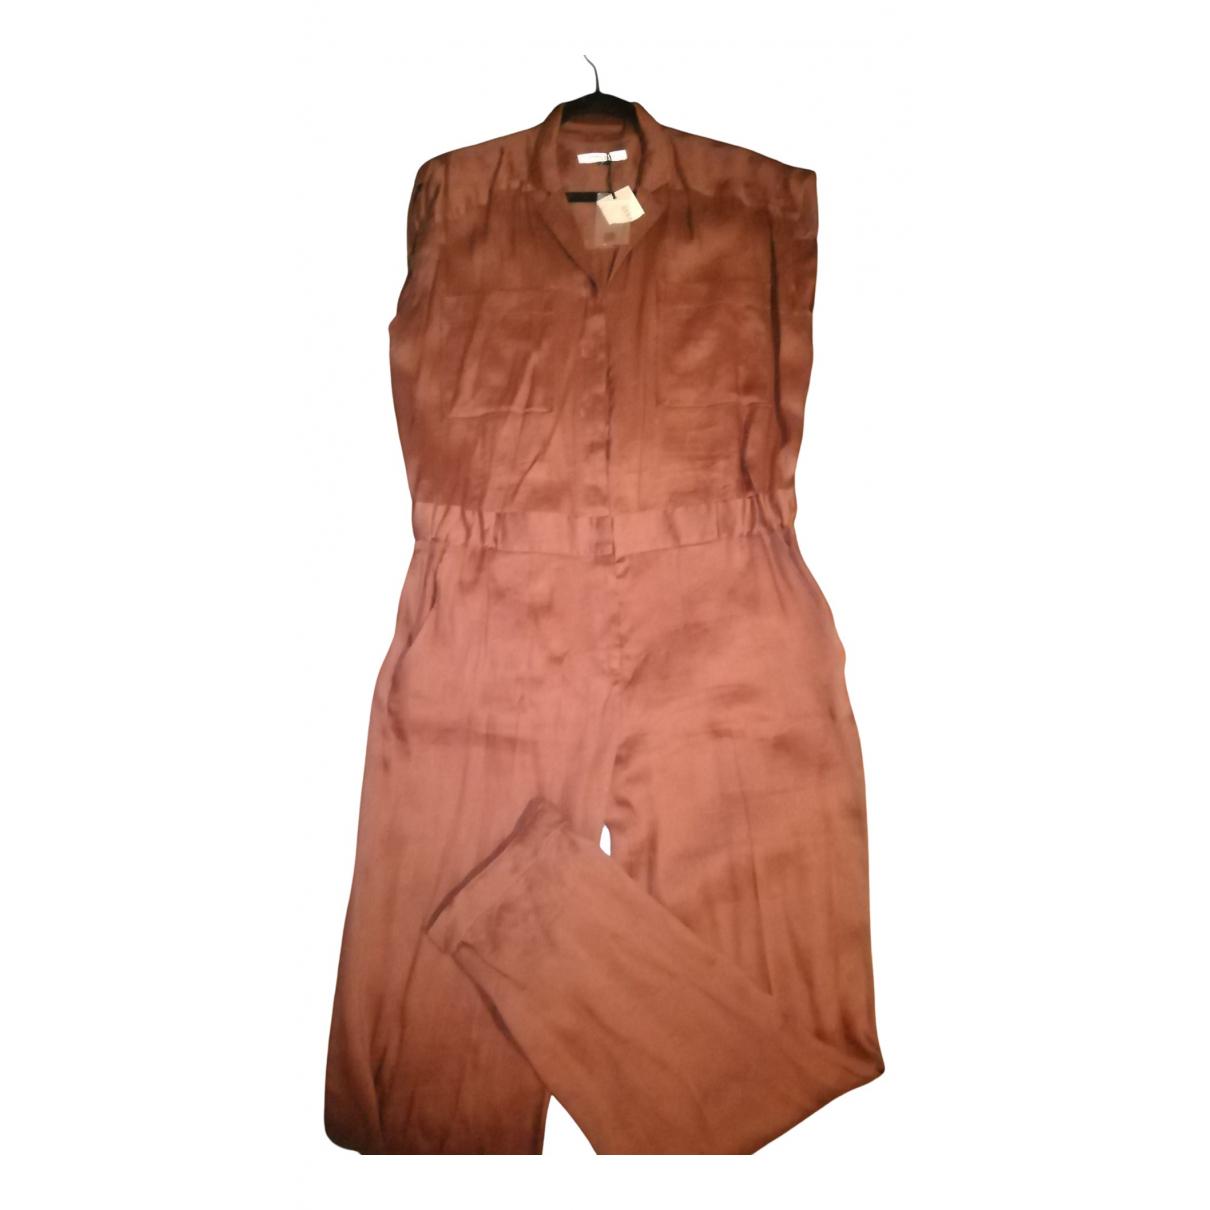 Gerard Darel - Combinaison   pour femme en lin - marron